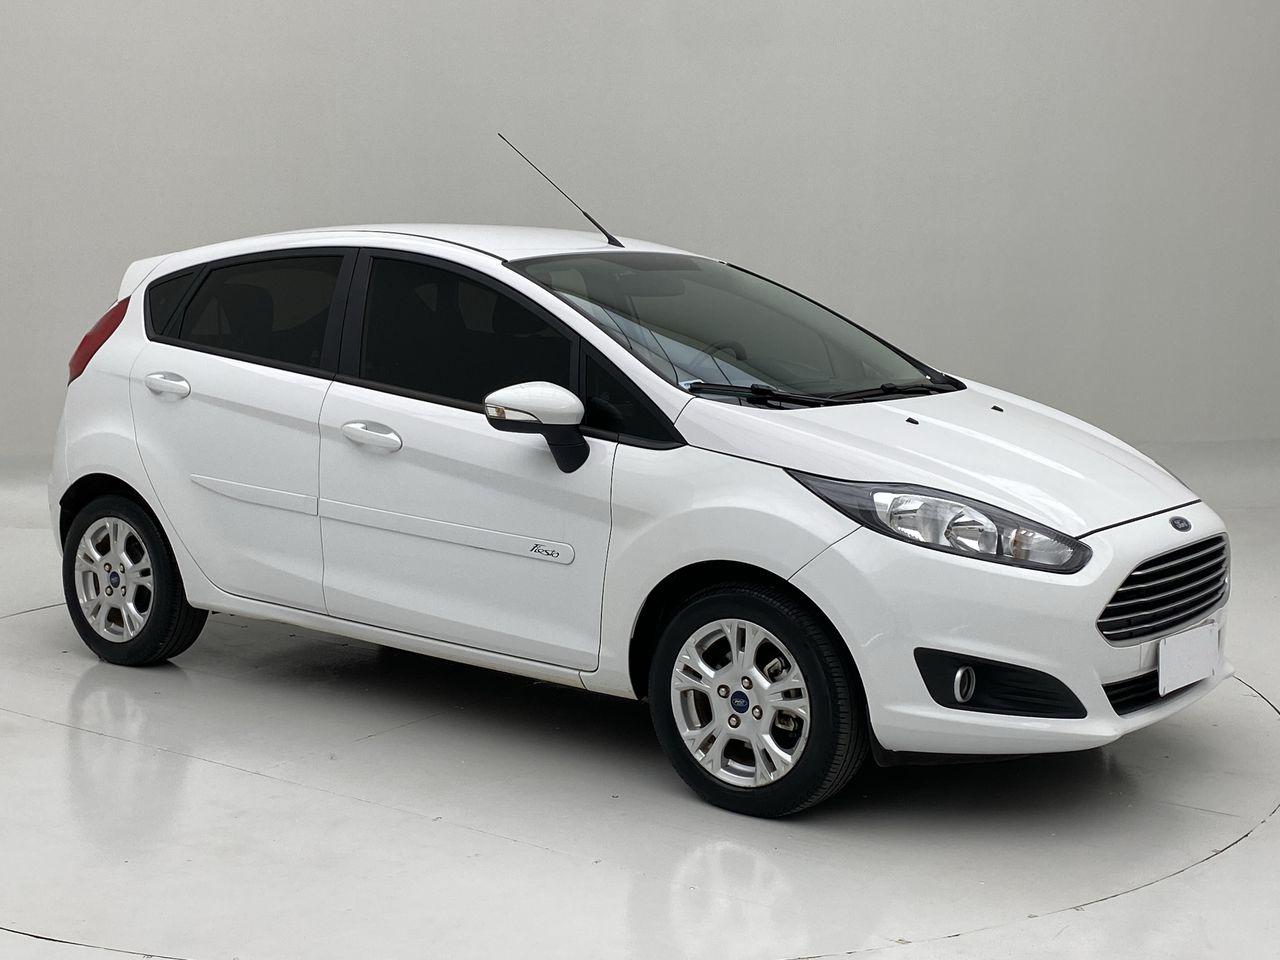 Fiesta SEL 1.0 12V EcoBoost Aut. 5p